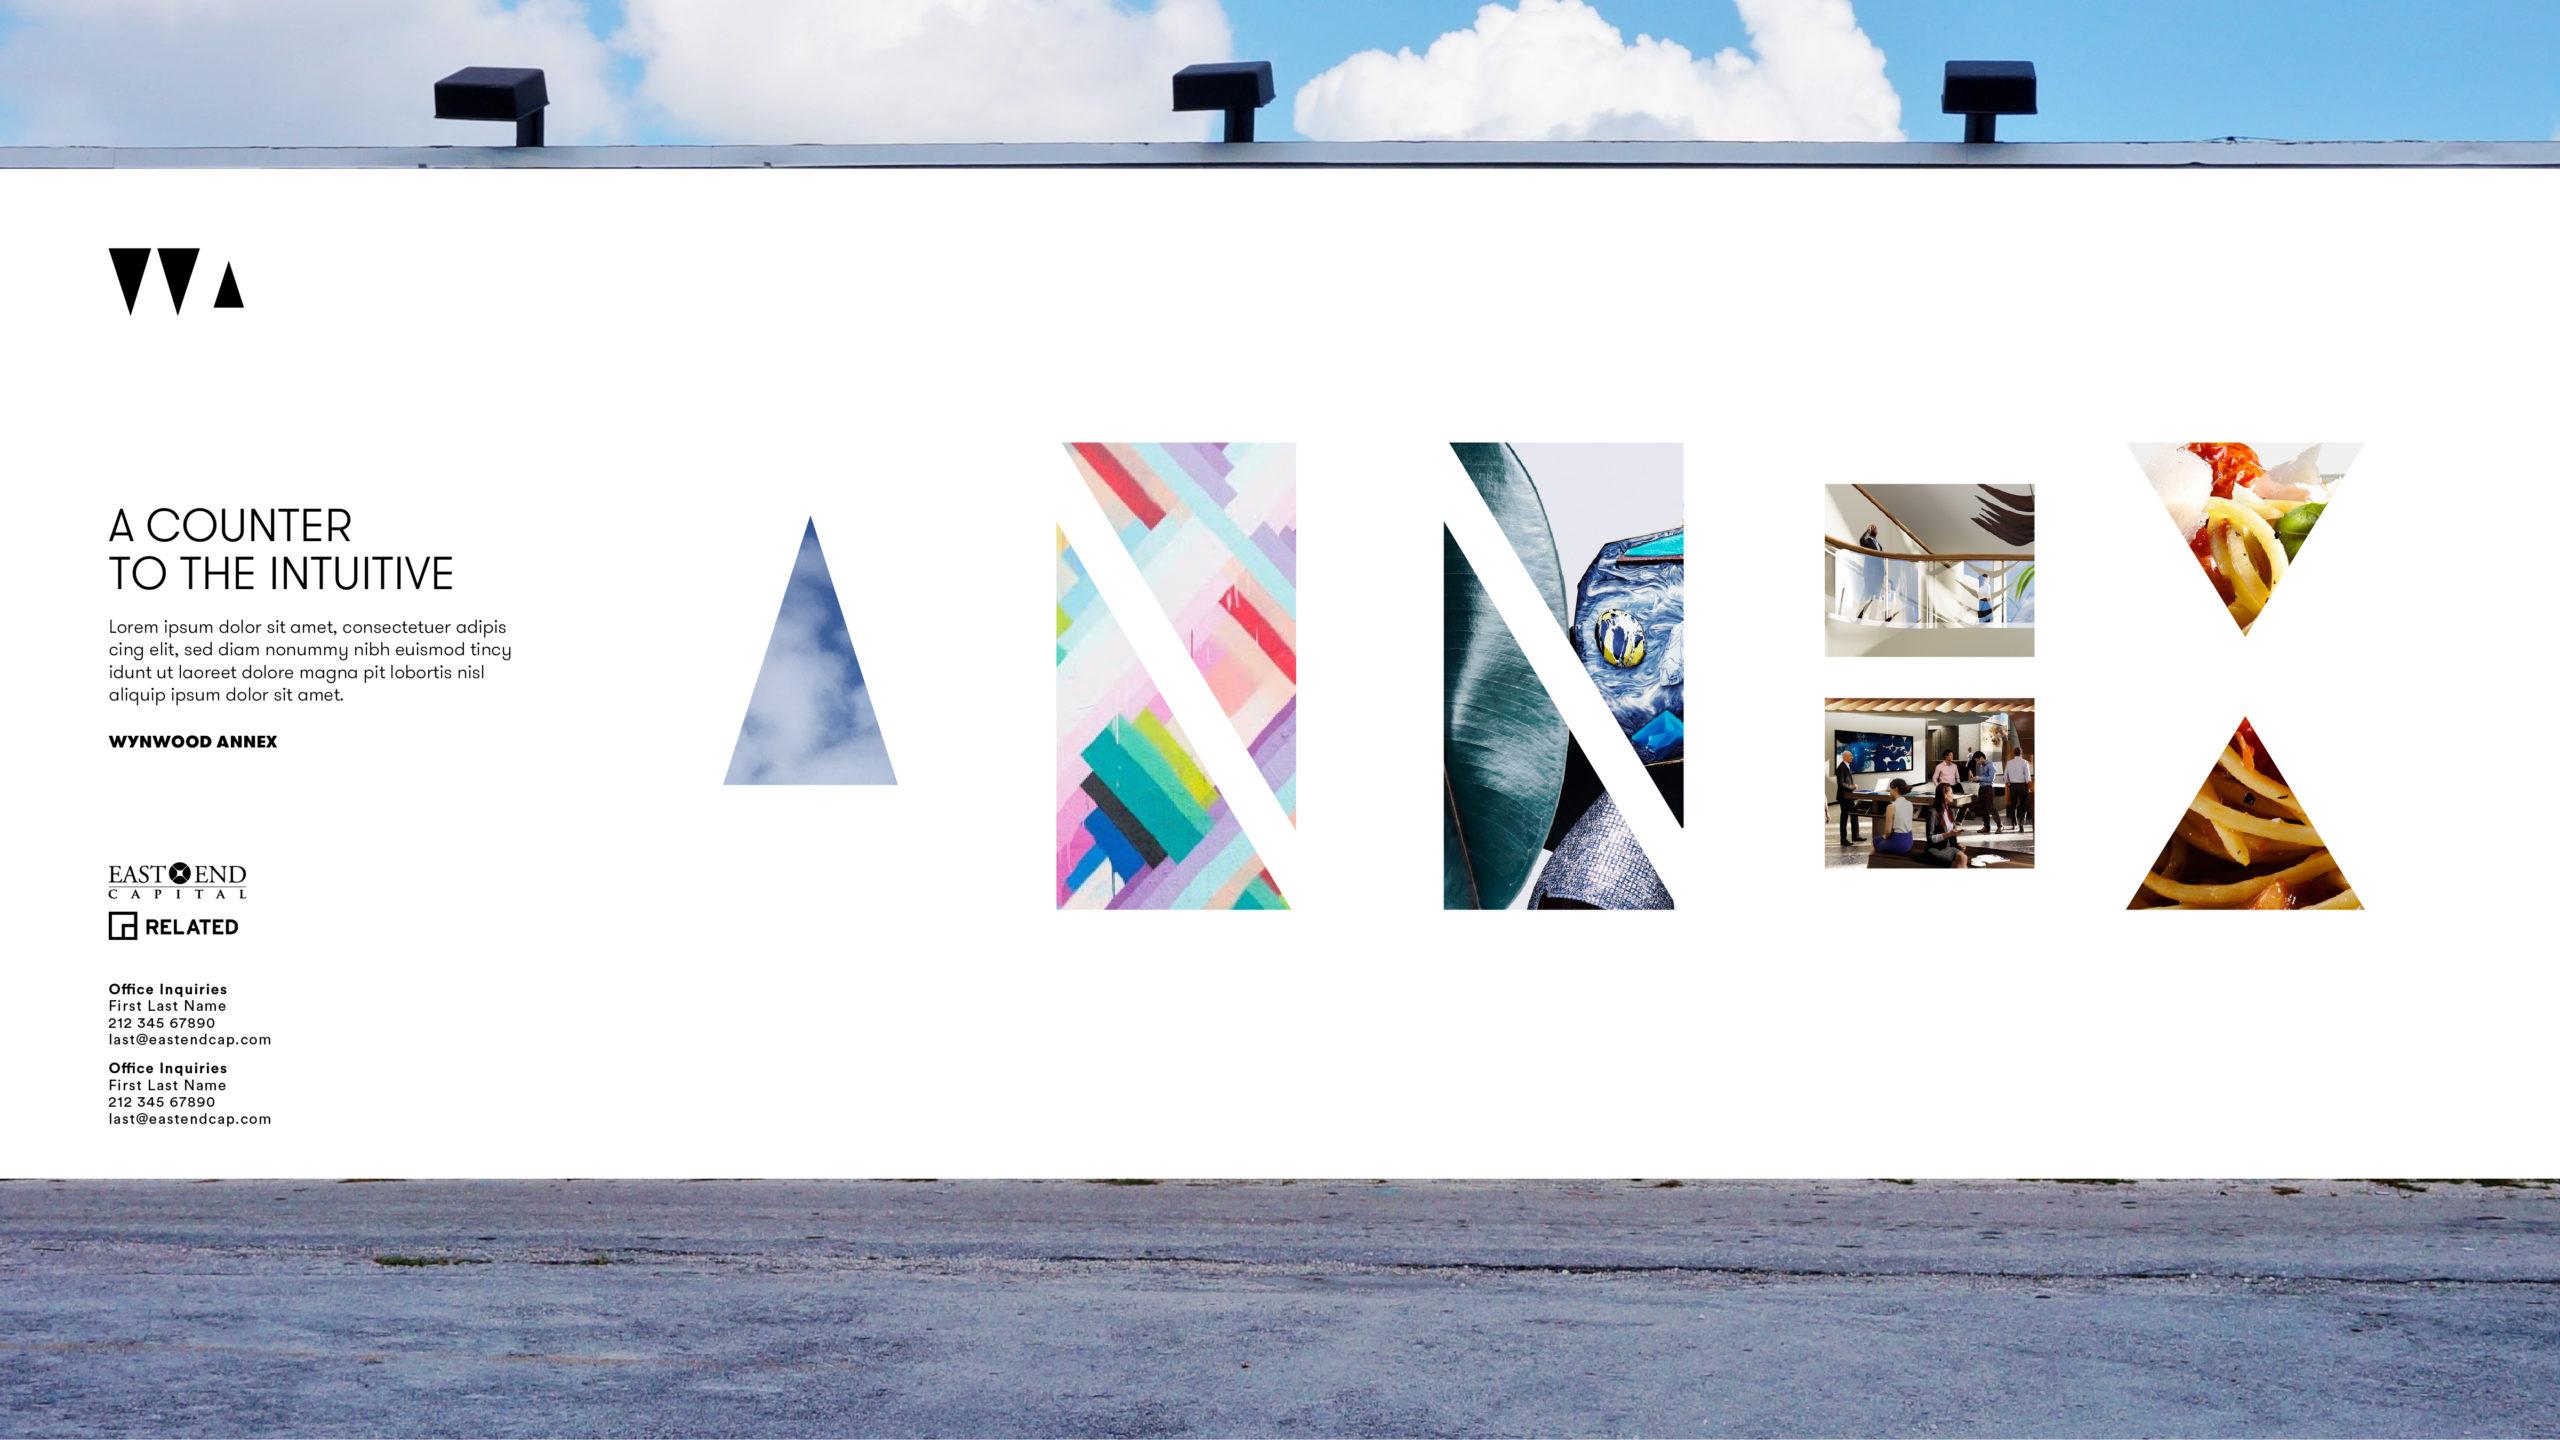 Wynwood-Annex_-concept-2_r3-19